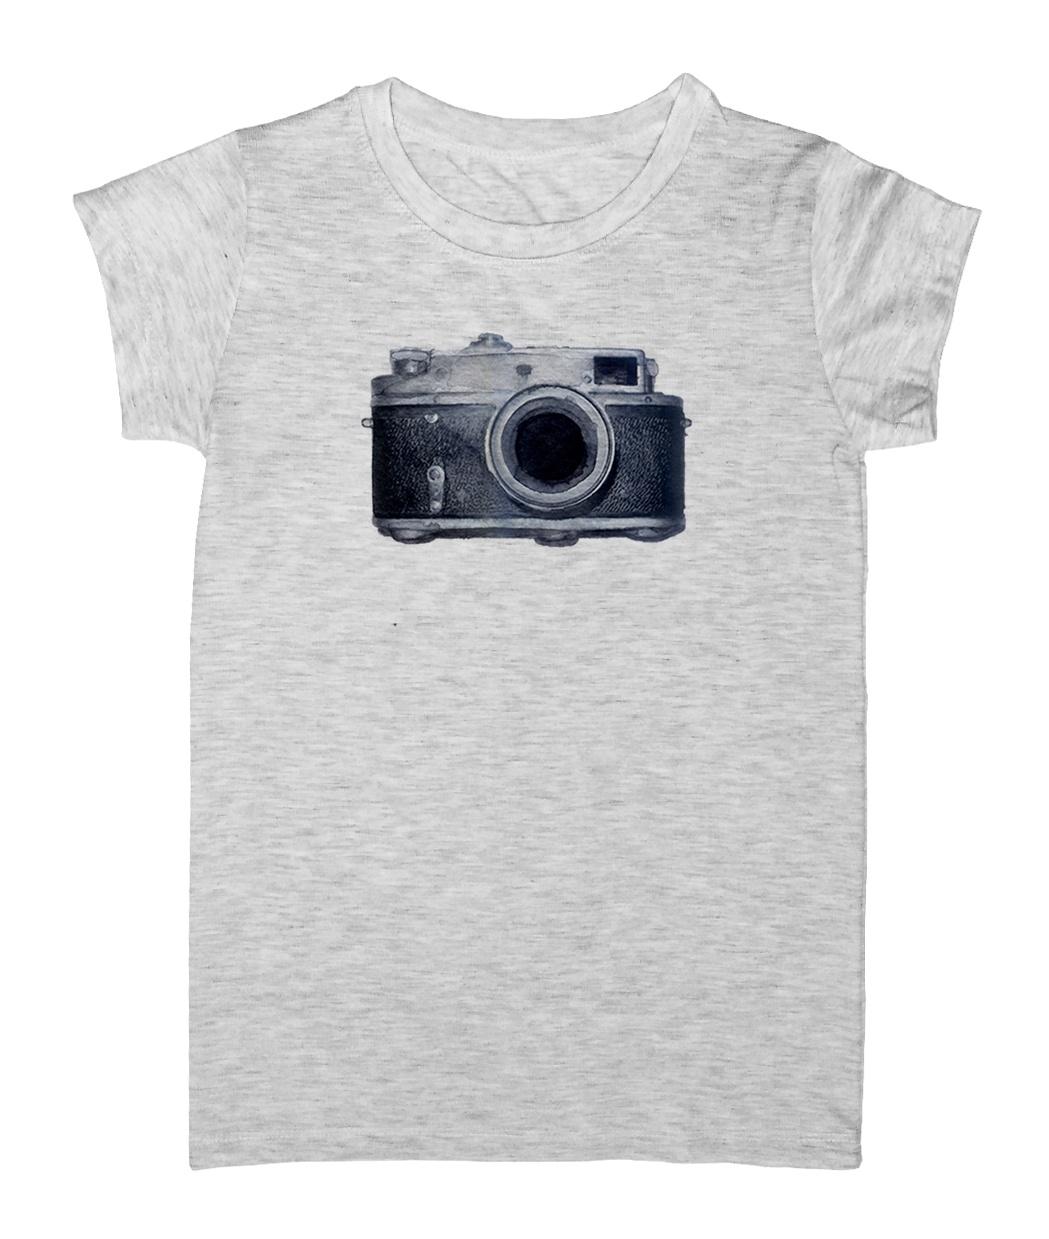 تصویر تی شرت زنانه طرح دوربین عکاسی مدل EZM56